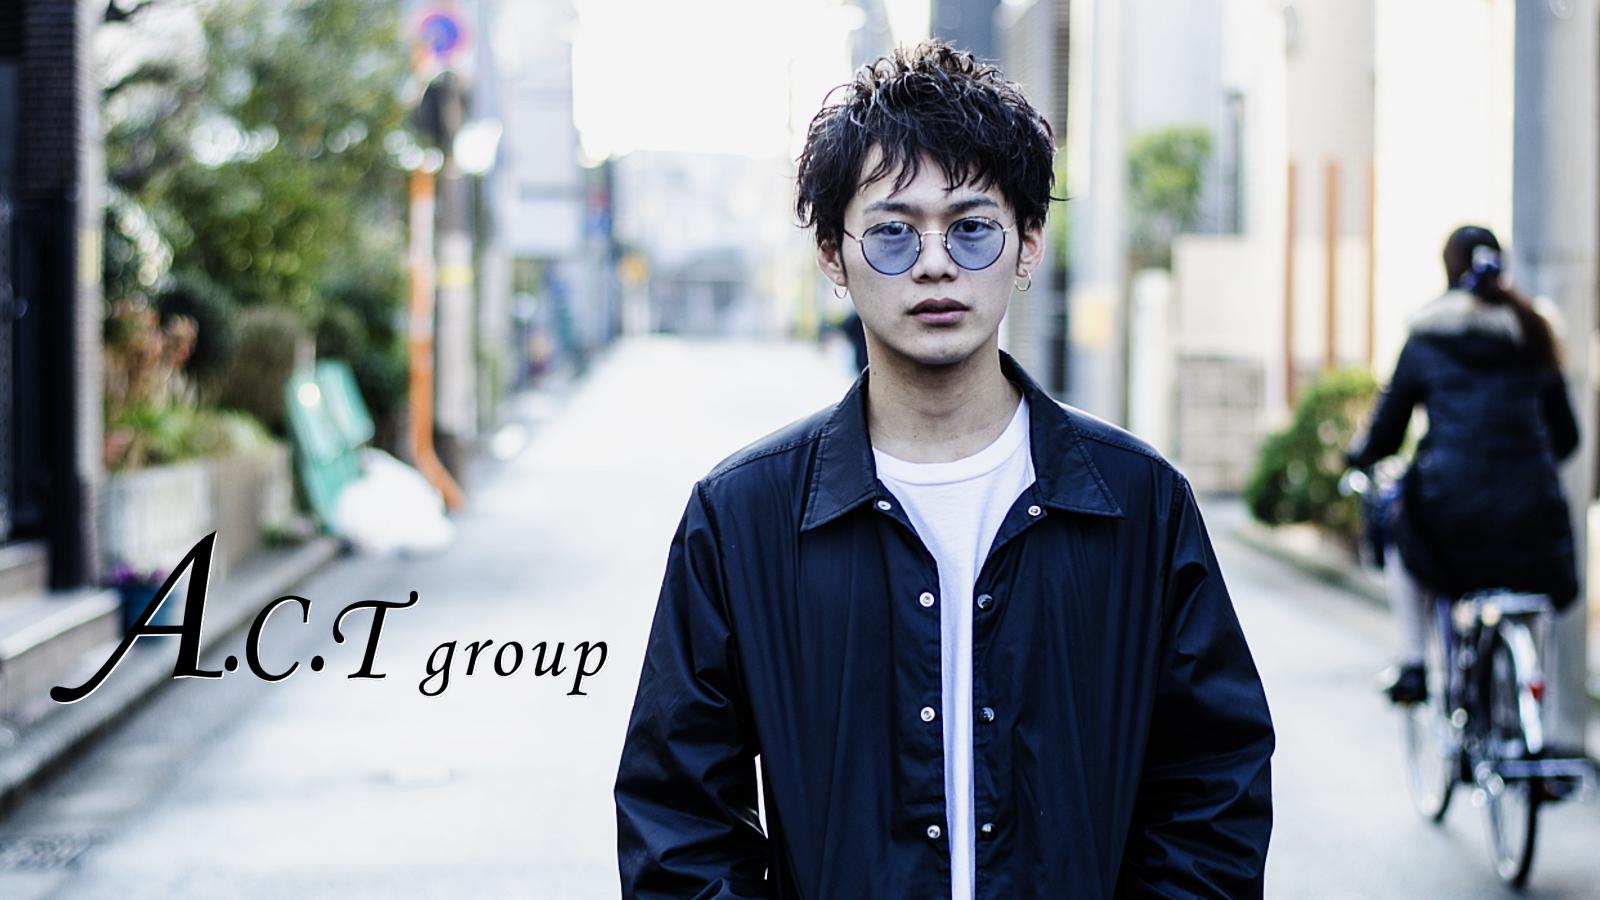 ACT GROUP(アクト グループ)日吉 美容室